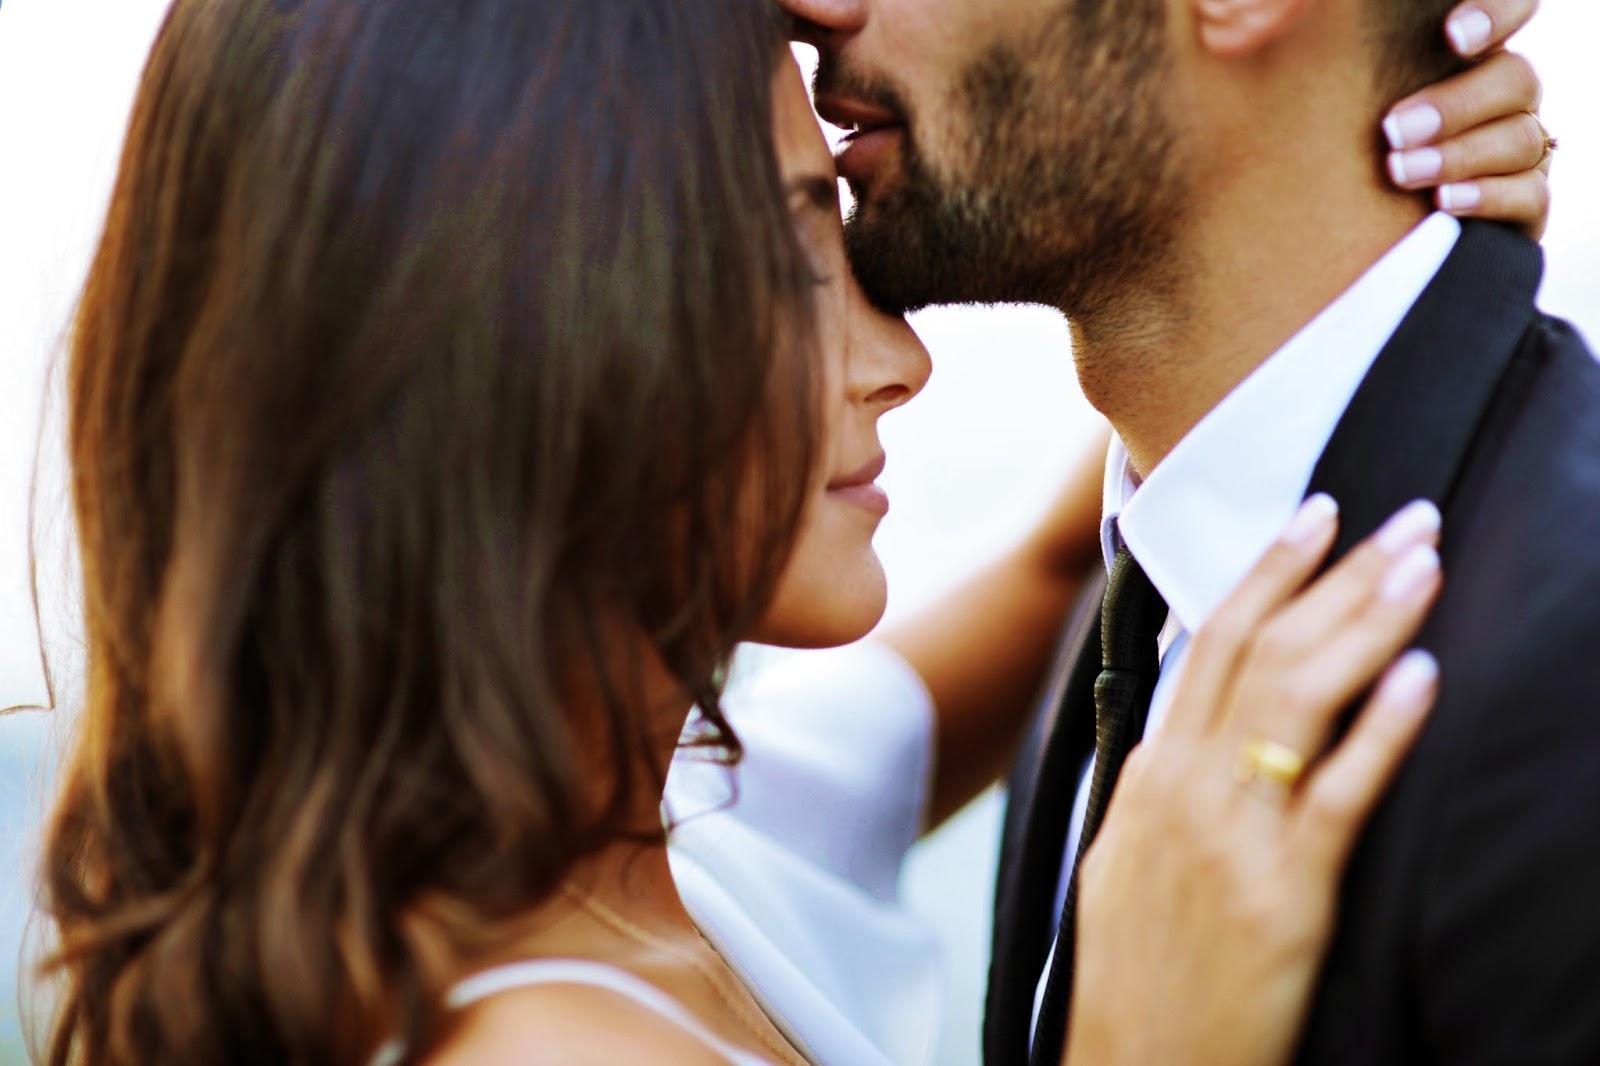 Paarbeziehung Mit Bindungsangst Free Pdf Ouvir Ebook Online Gratis